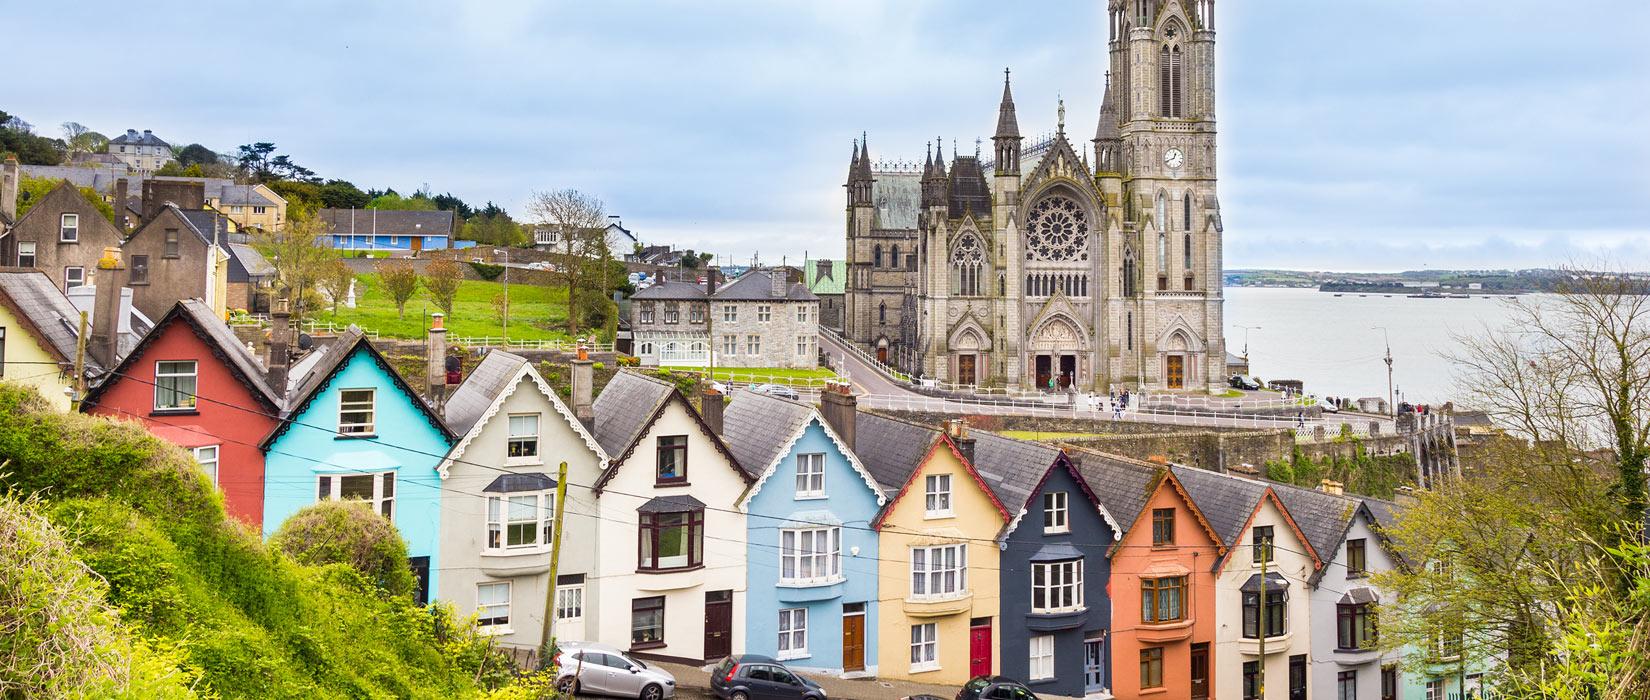 10 Best Cobh Hotels, Ireland (From $67) - uselesspenguin.co.uk